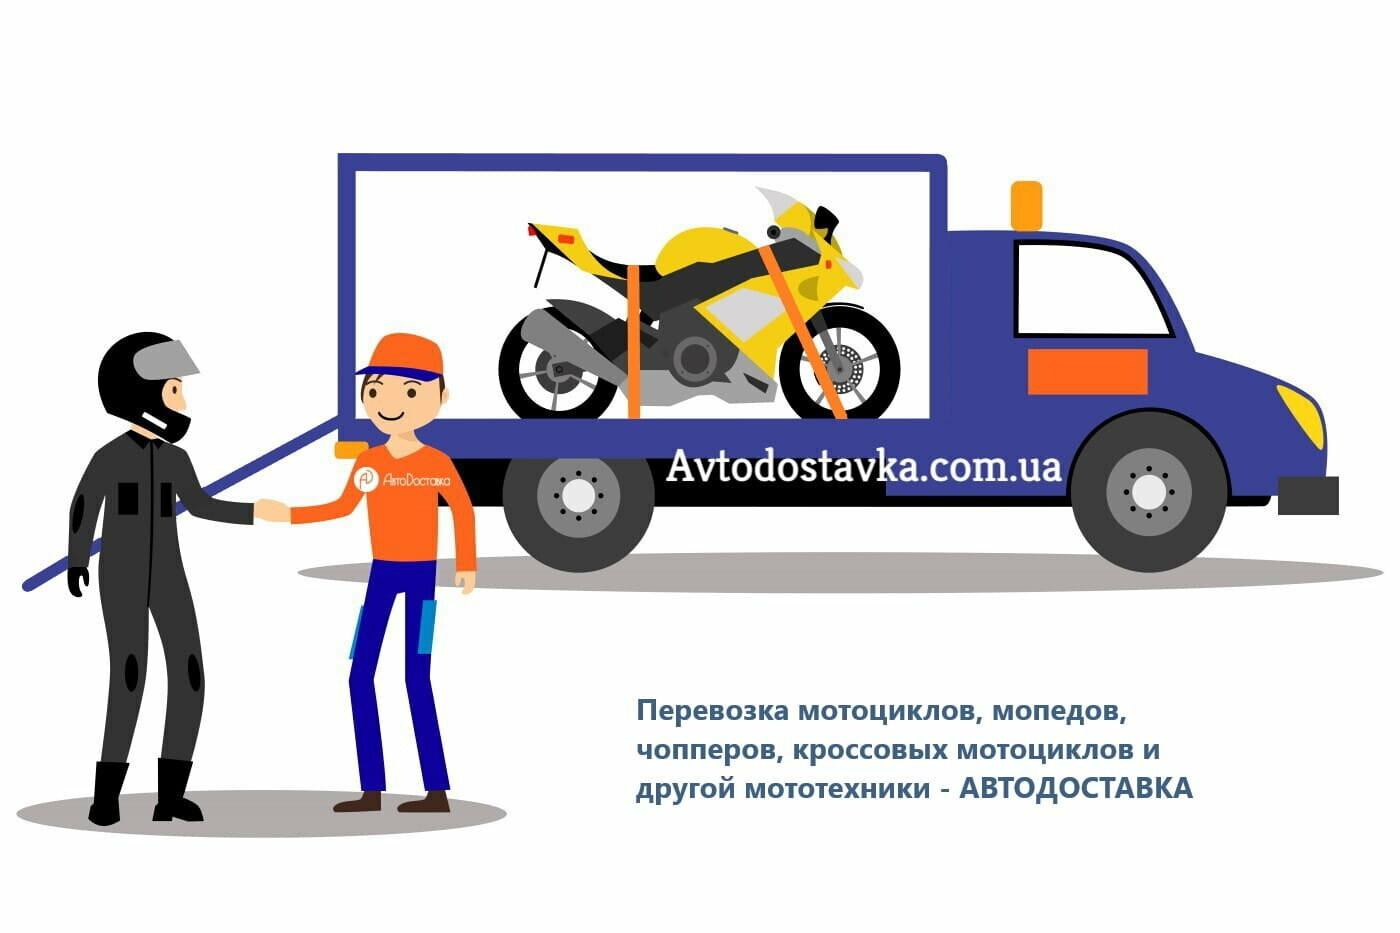 Перевозка мотоцикла по Украине - Автодоставка, фото-8